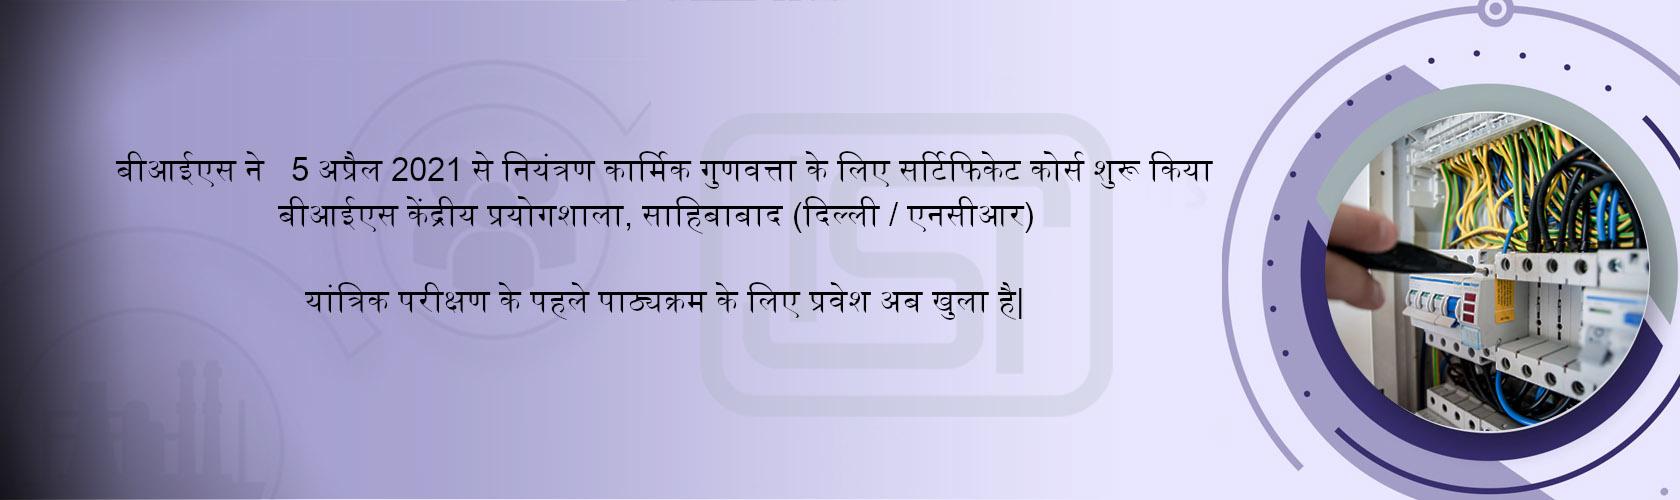 414316146quality-control-hindi